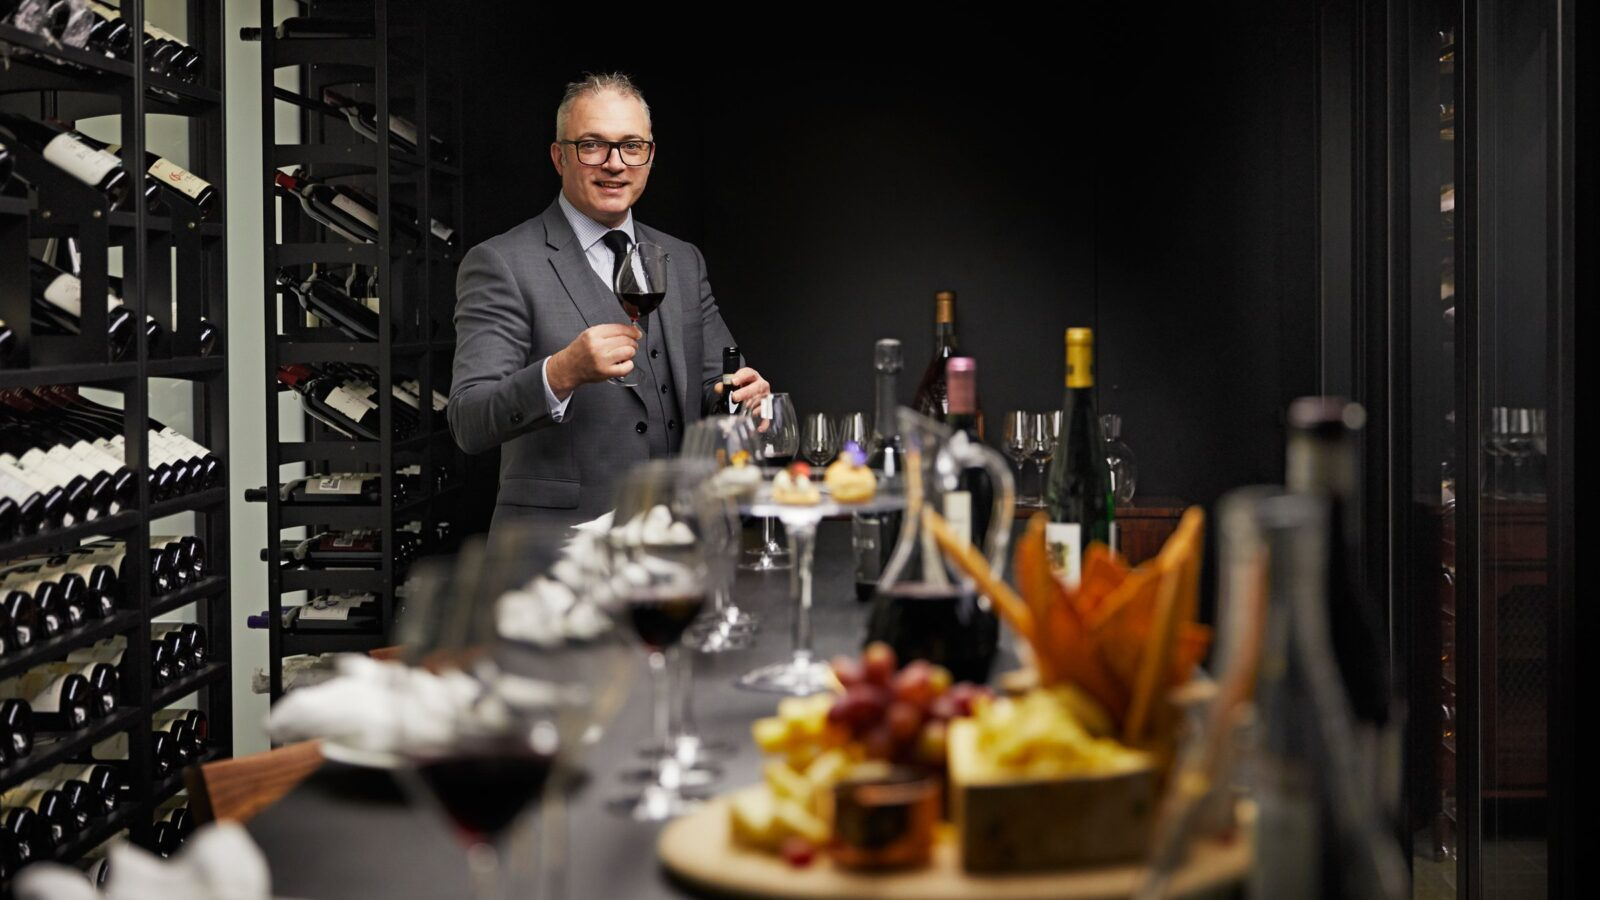 The wonderful world of wine